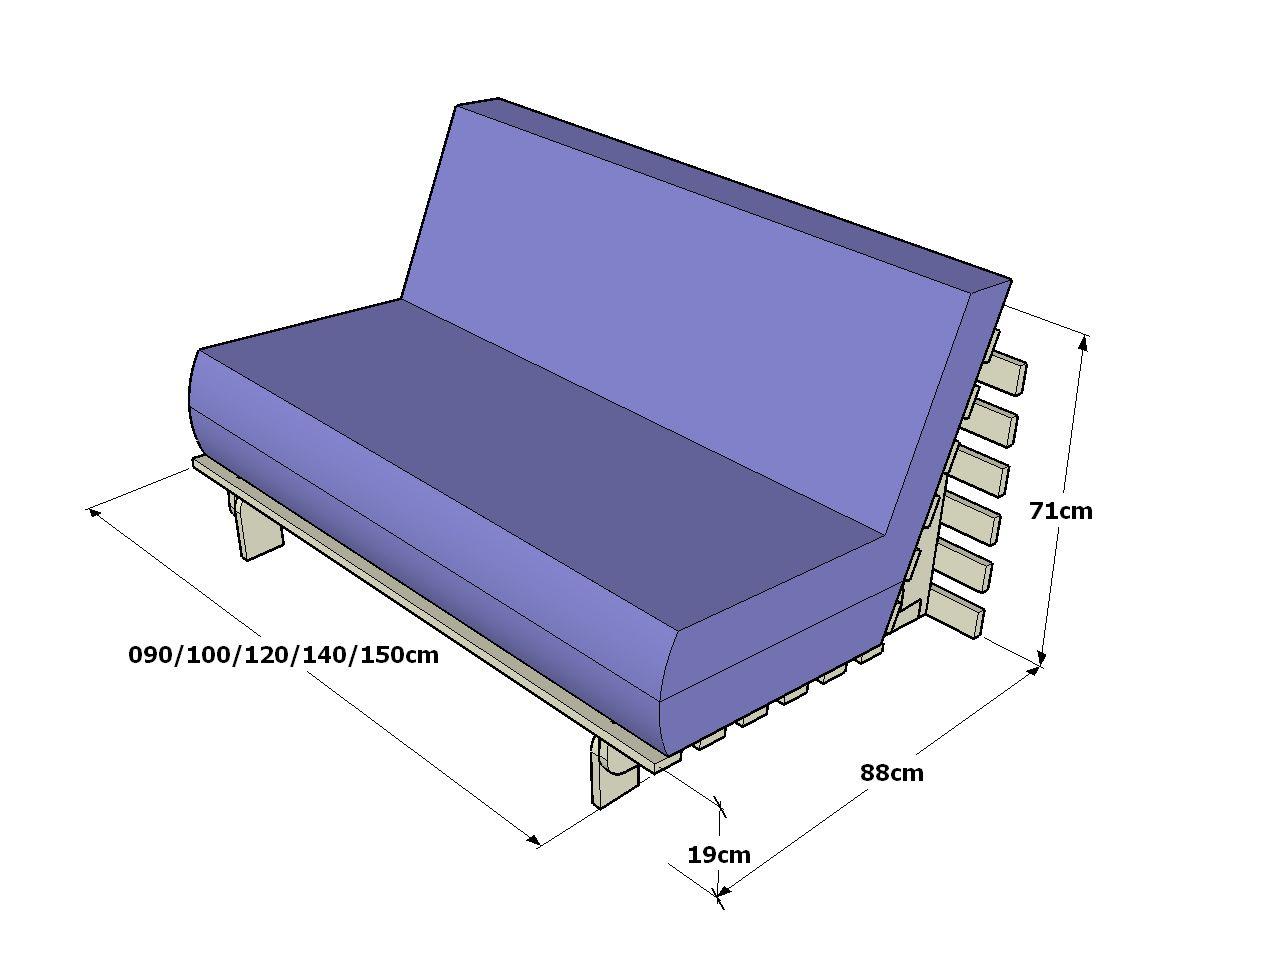 futon sof cama plegable la estructura del futon sof cama